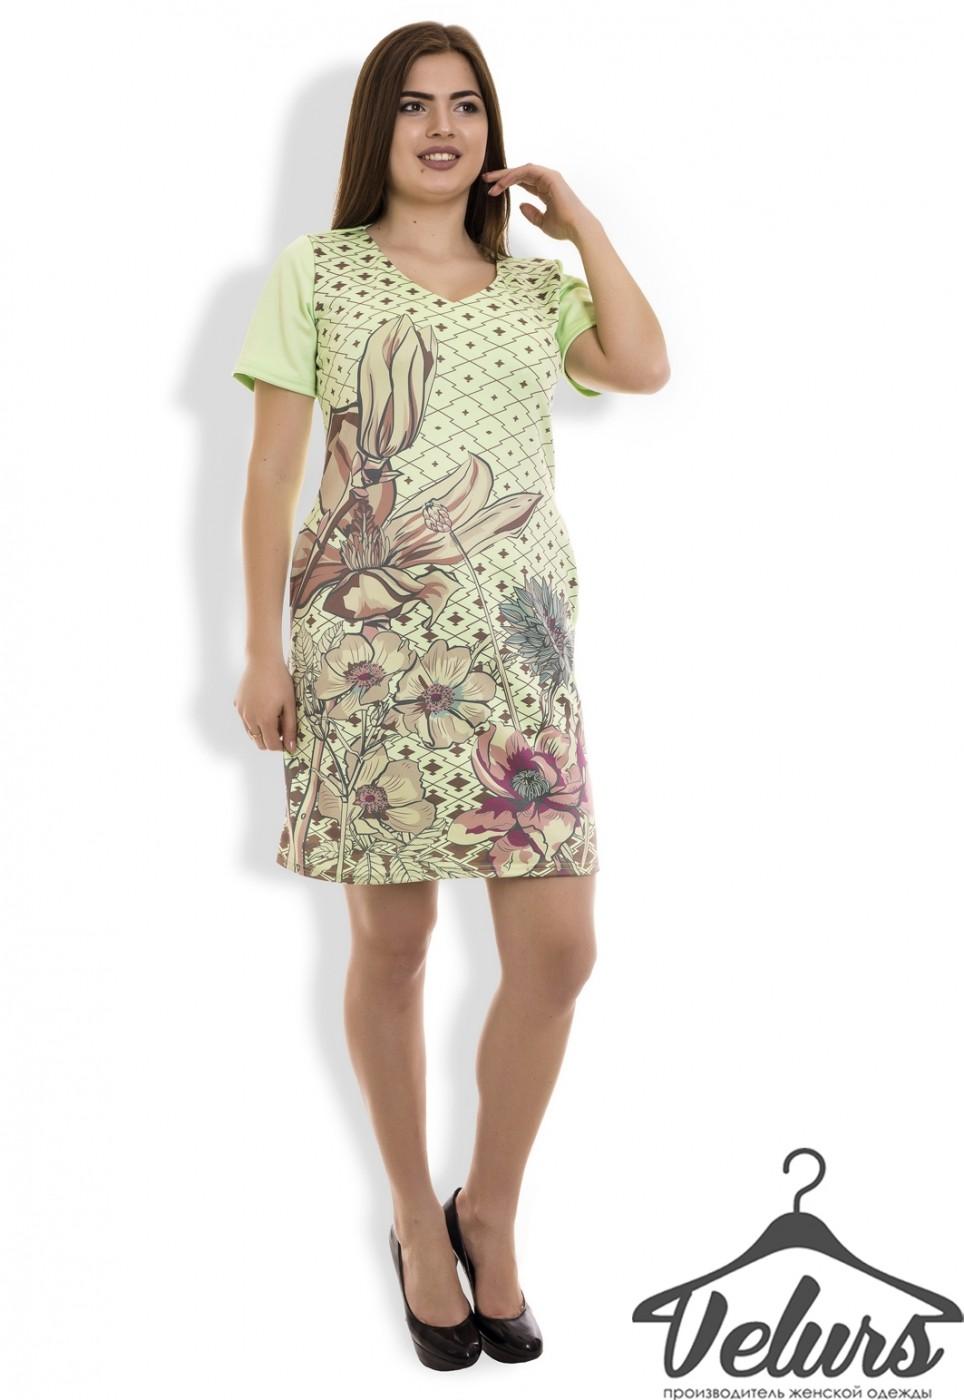 Velurs: Платье 212110 - фото 1